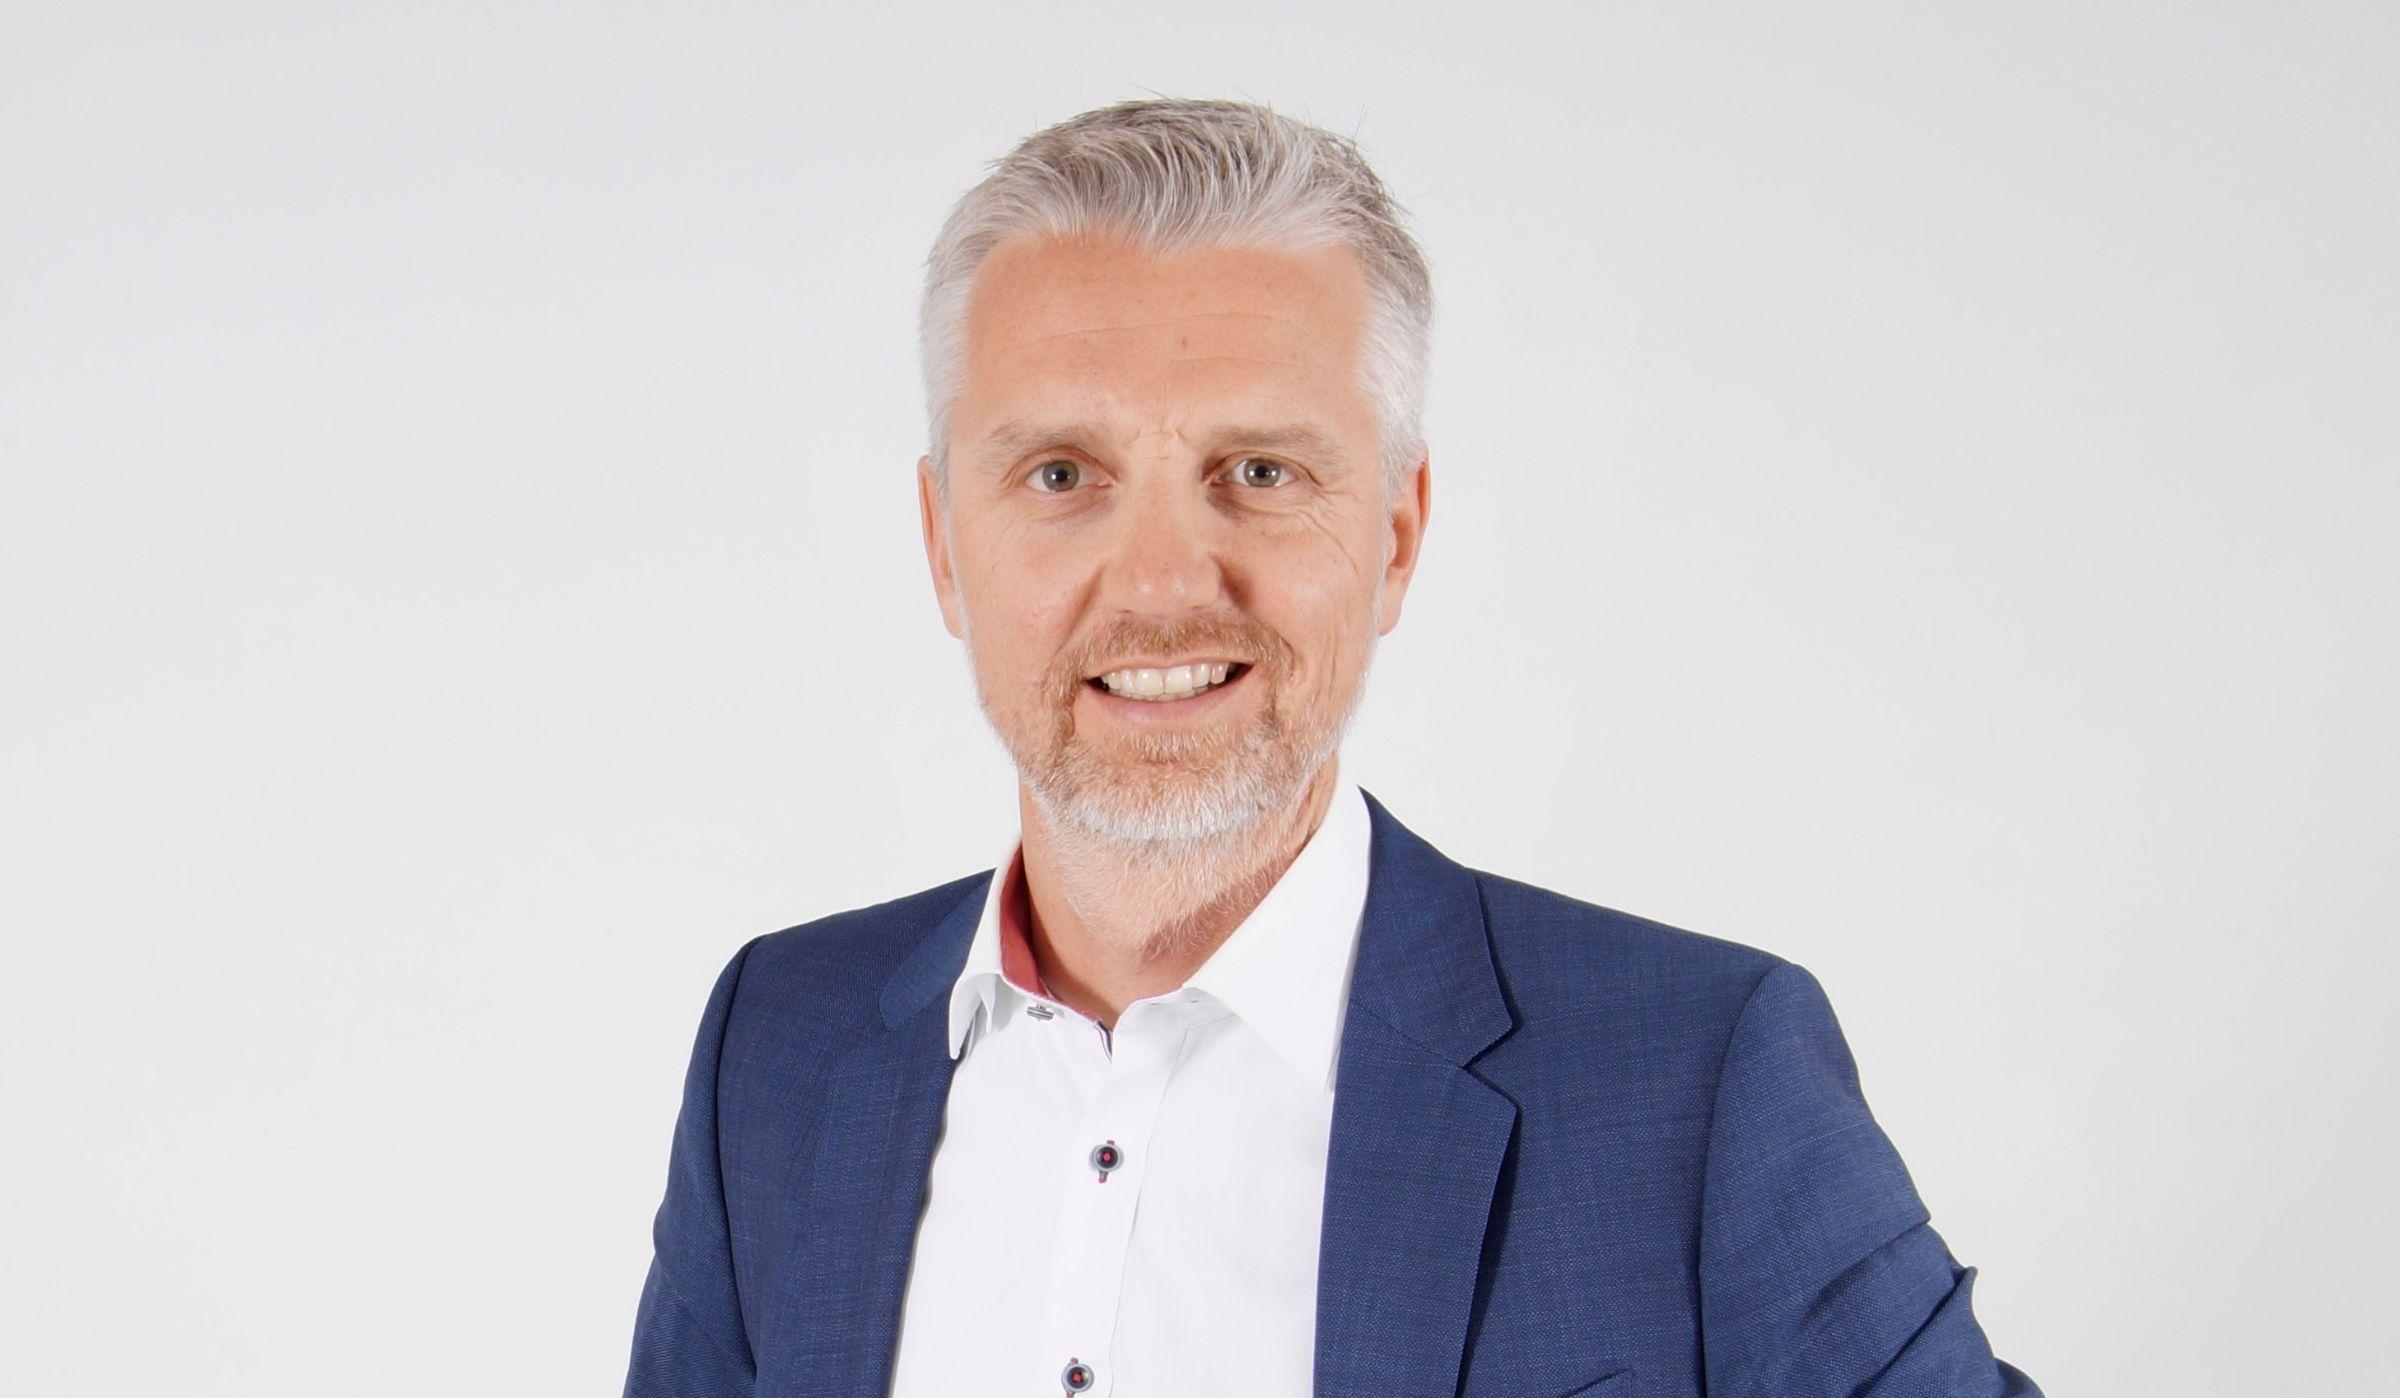 Frank Noe Partnermanager, JobRad